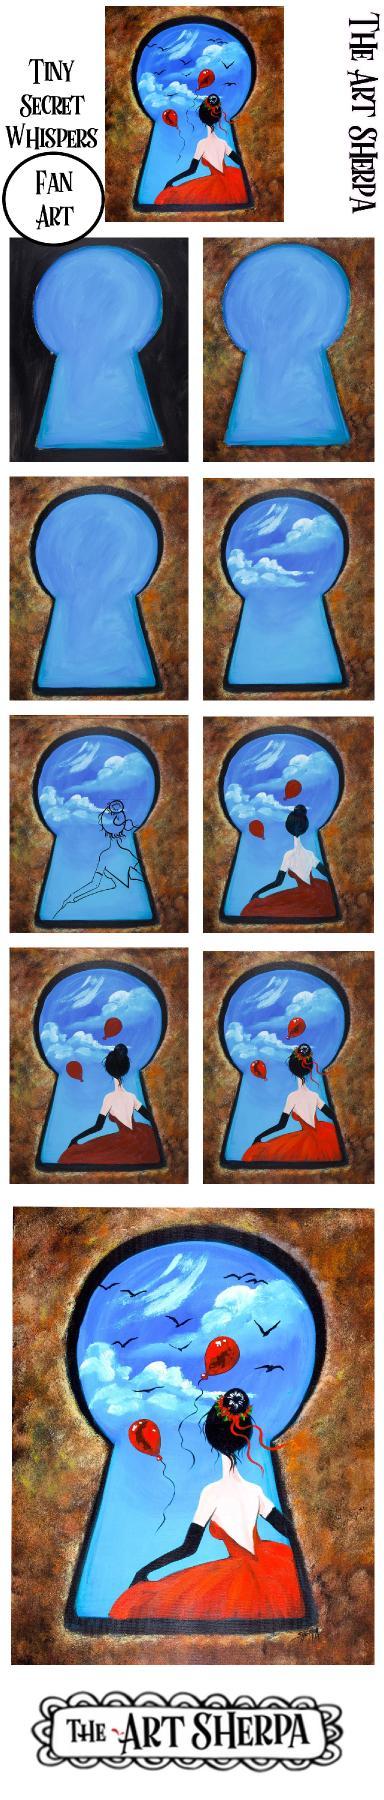 Easy Tiny Secret Whispers   Fan Art  Step by step Acrylic Tutorial    TheArtSherpa